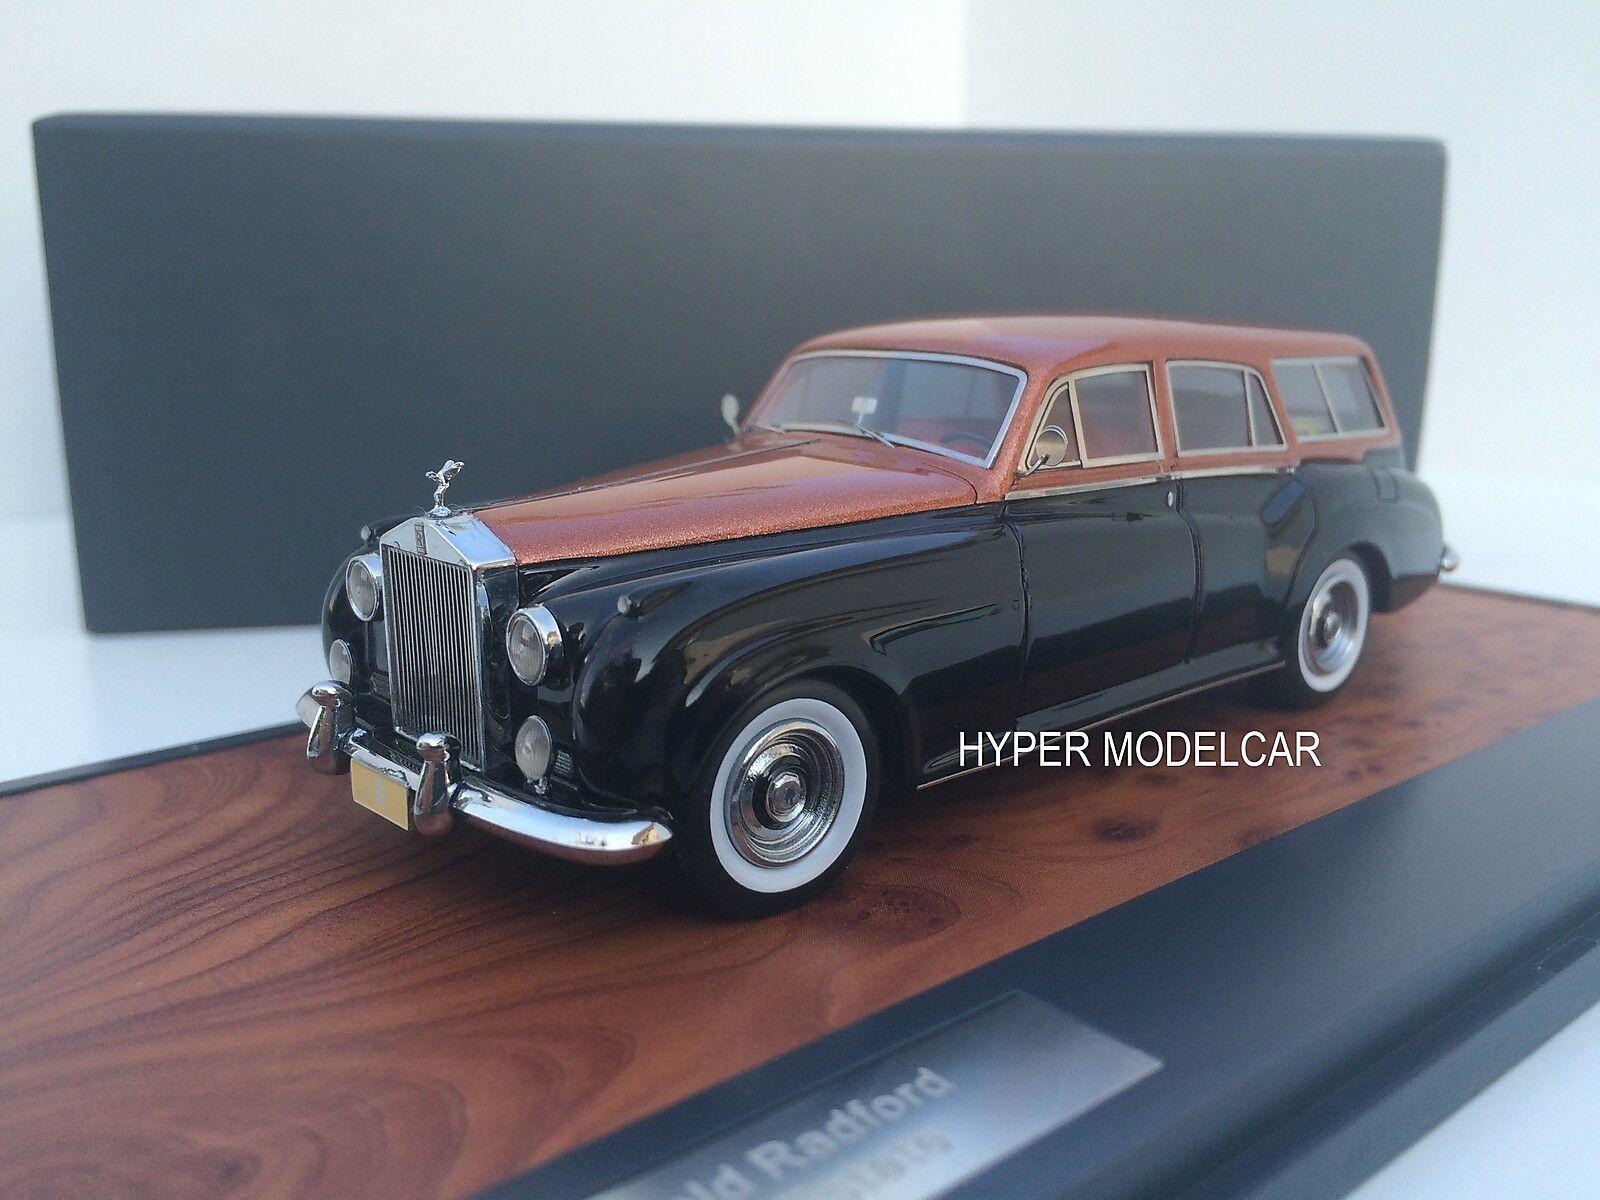 entrega rápida MATRIX 1 43 Rolls Royce plata Cloud Radford SC Estate Estate Estate 1959  Art. MX11705-0731  venta al por mayor barato